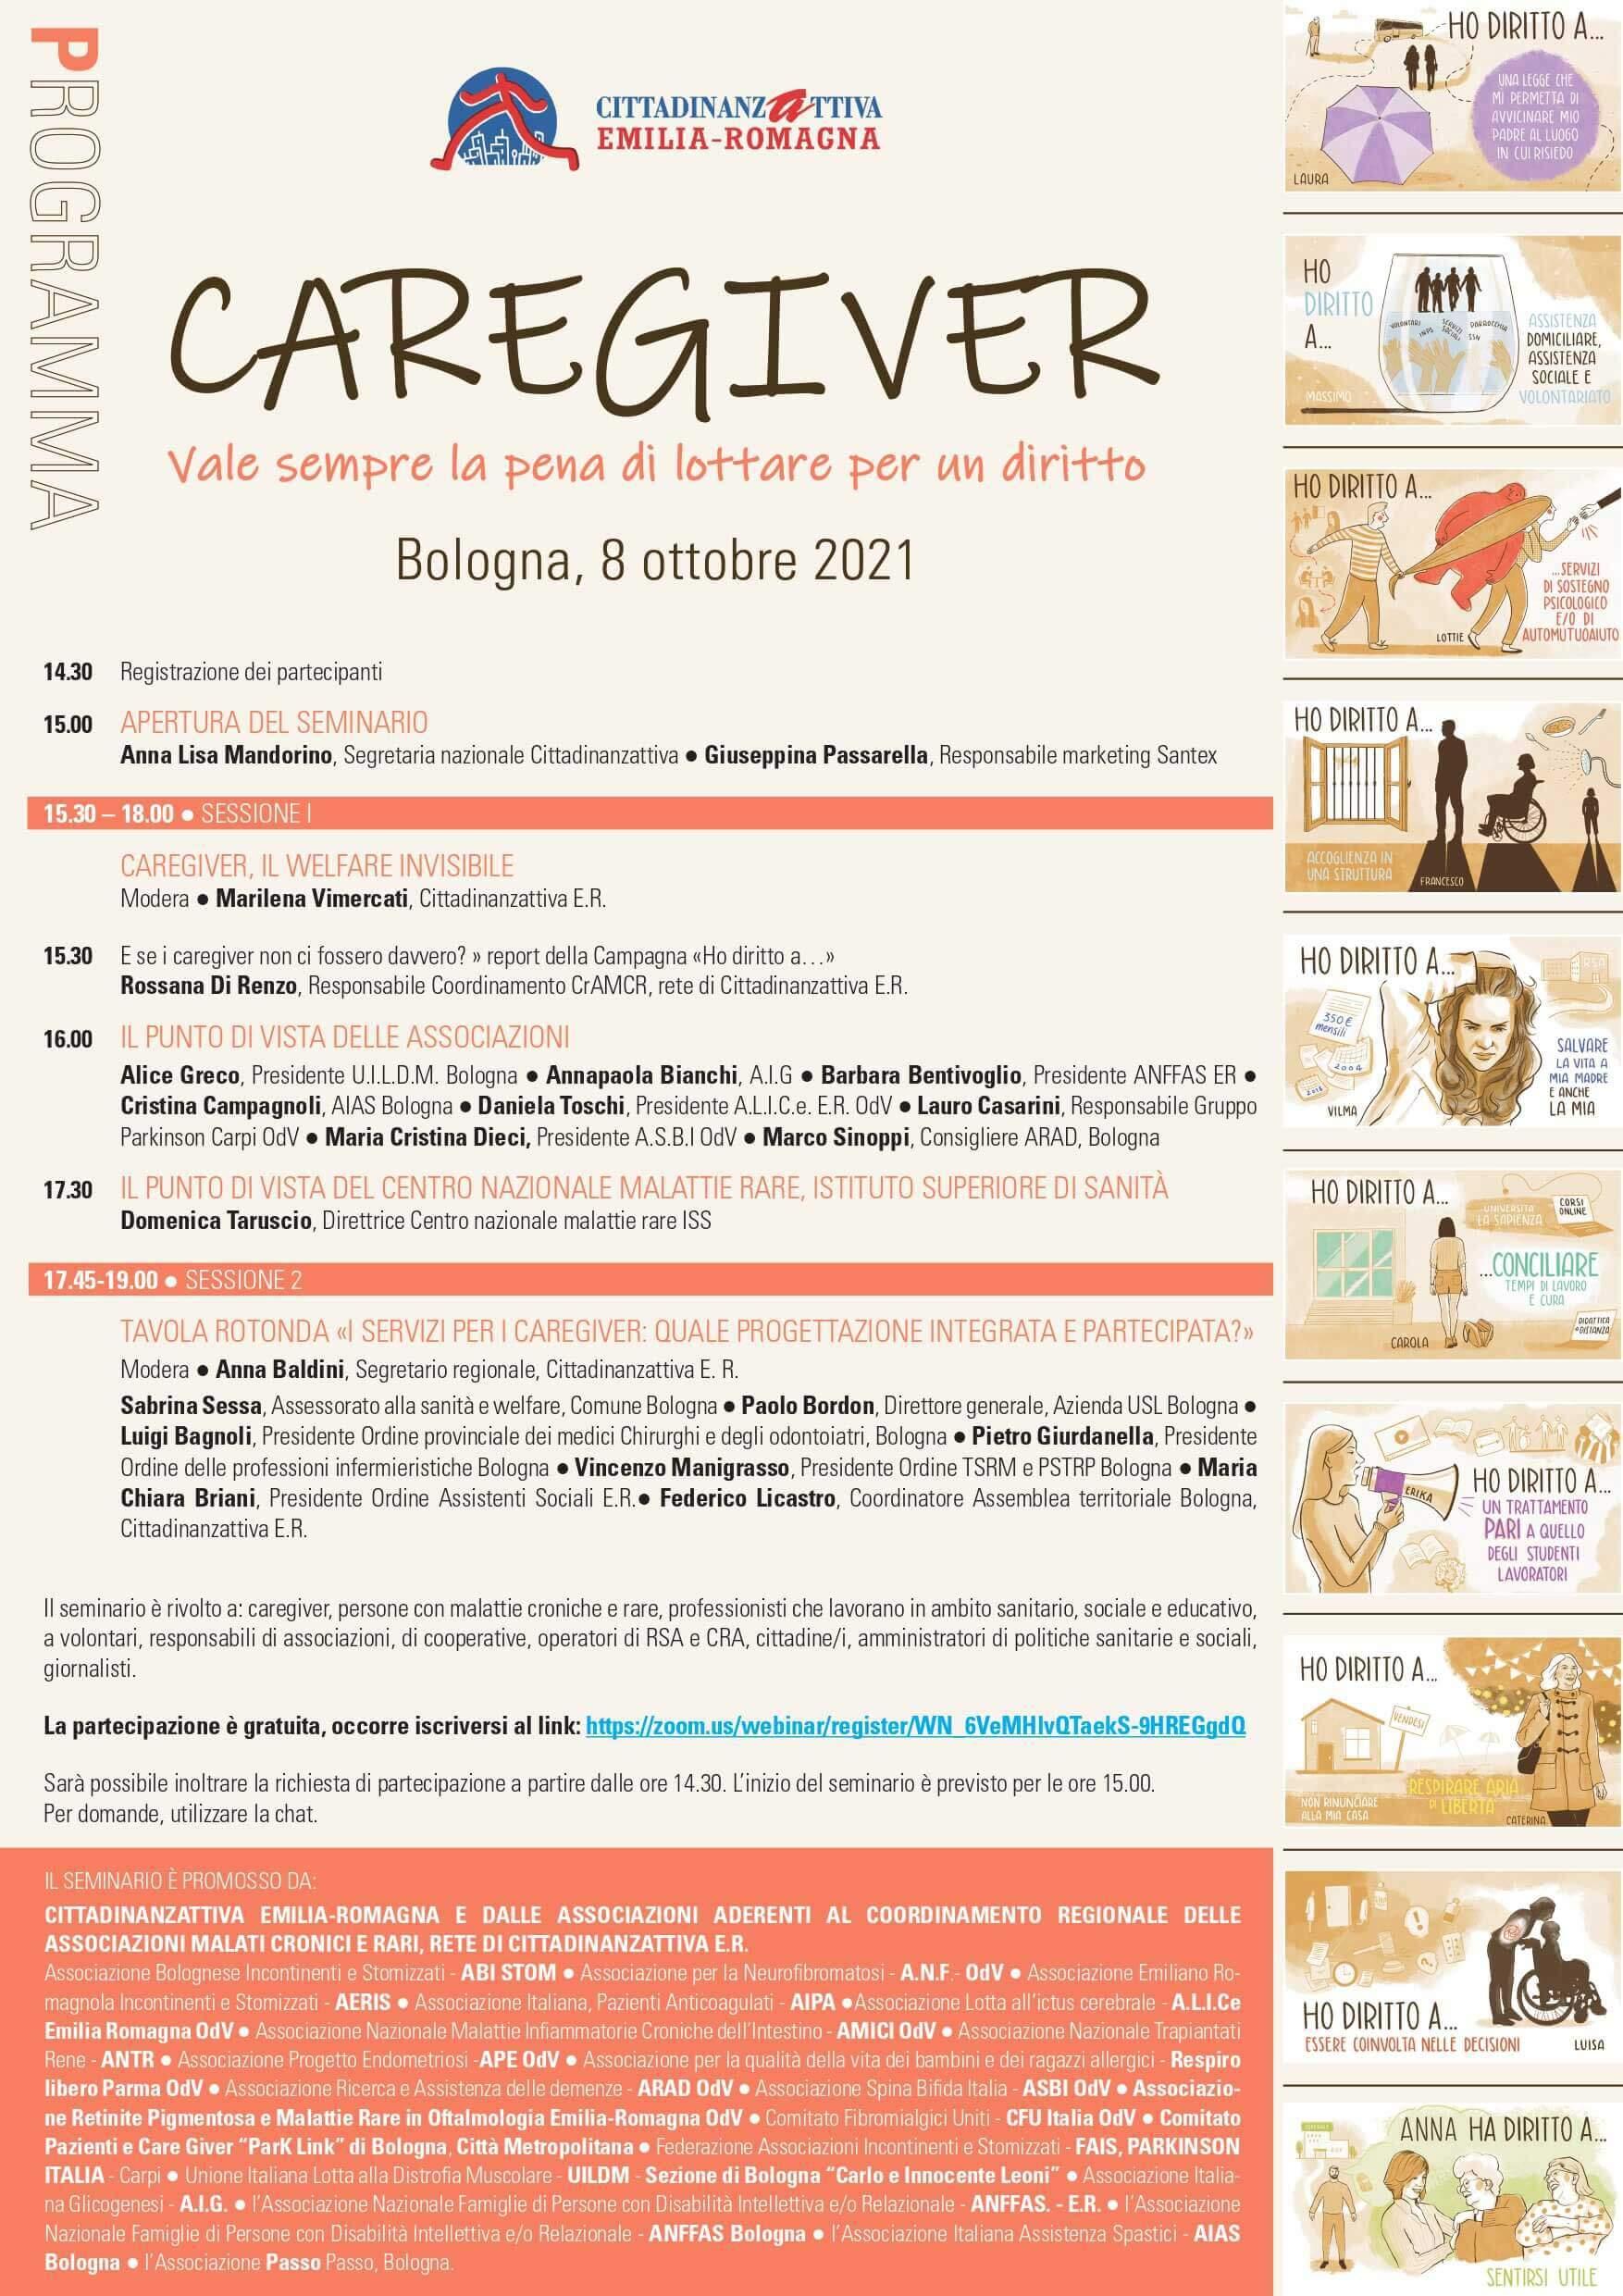 Locandina Caregiver